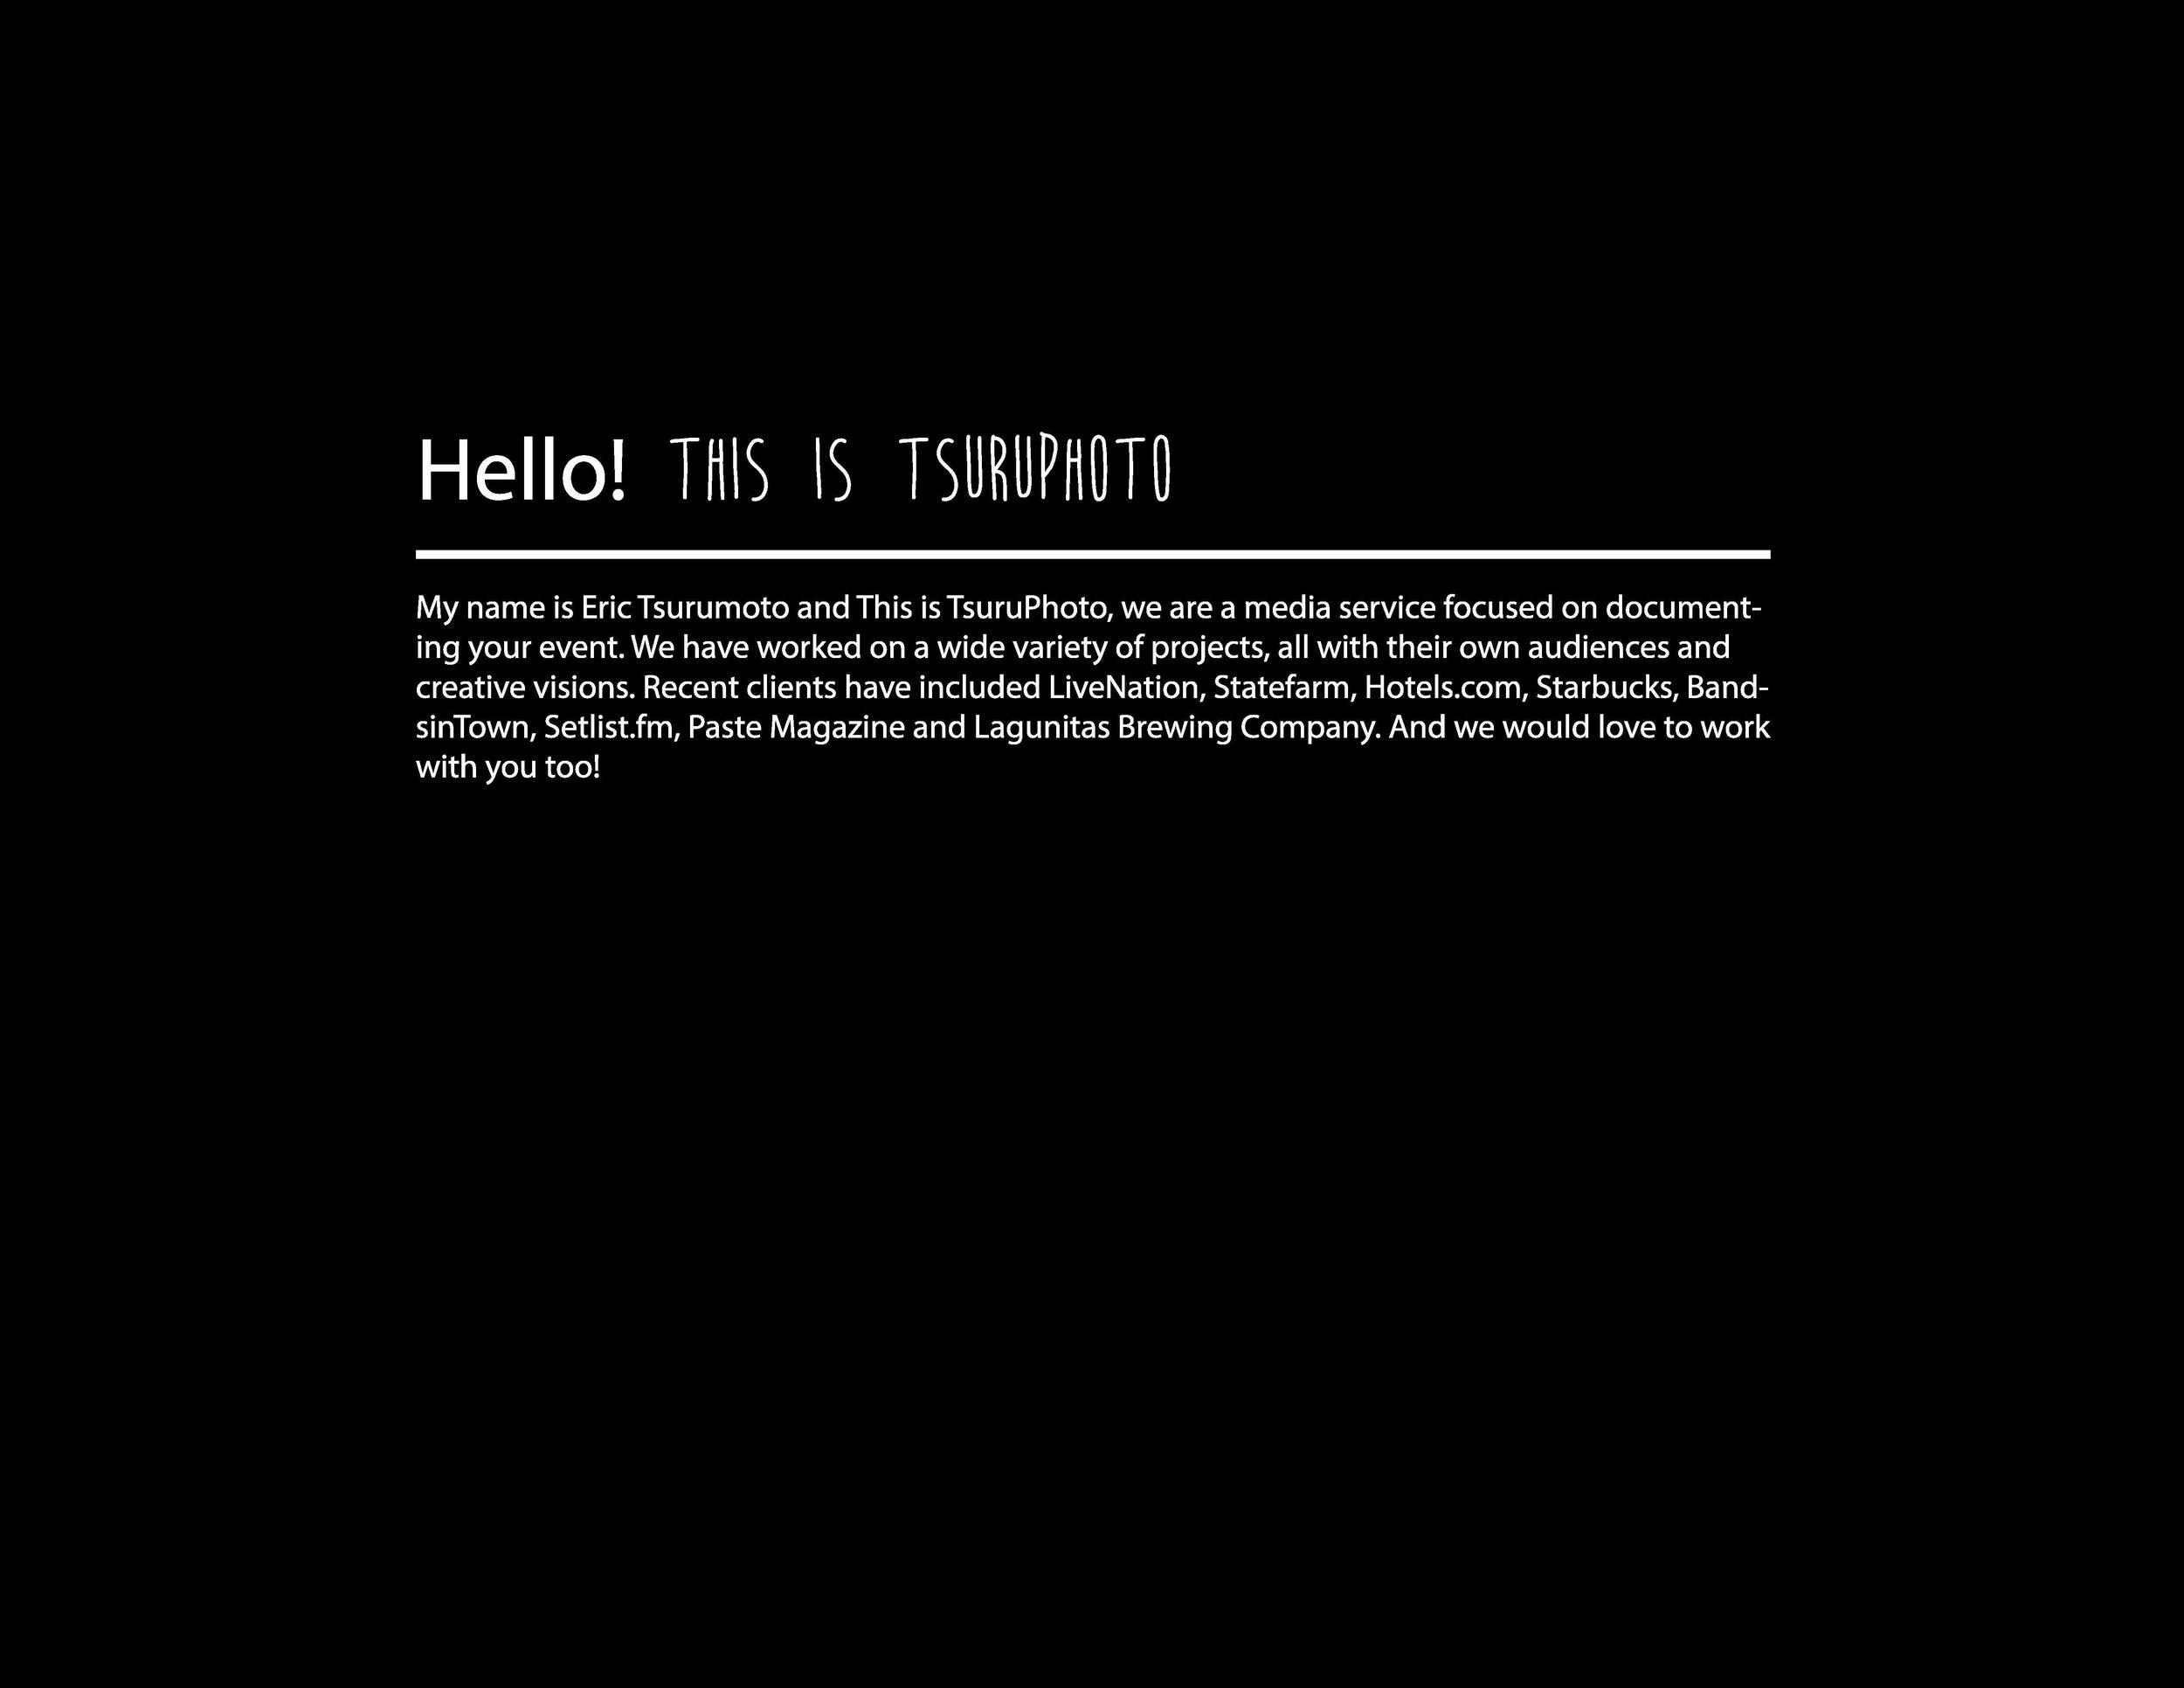 Tsuruphoto 2-09_Page_02.jpg